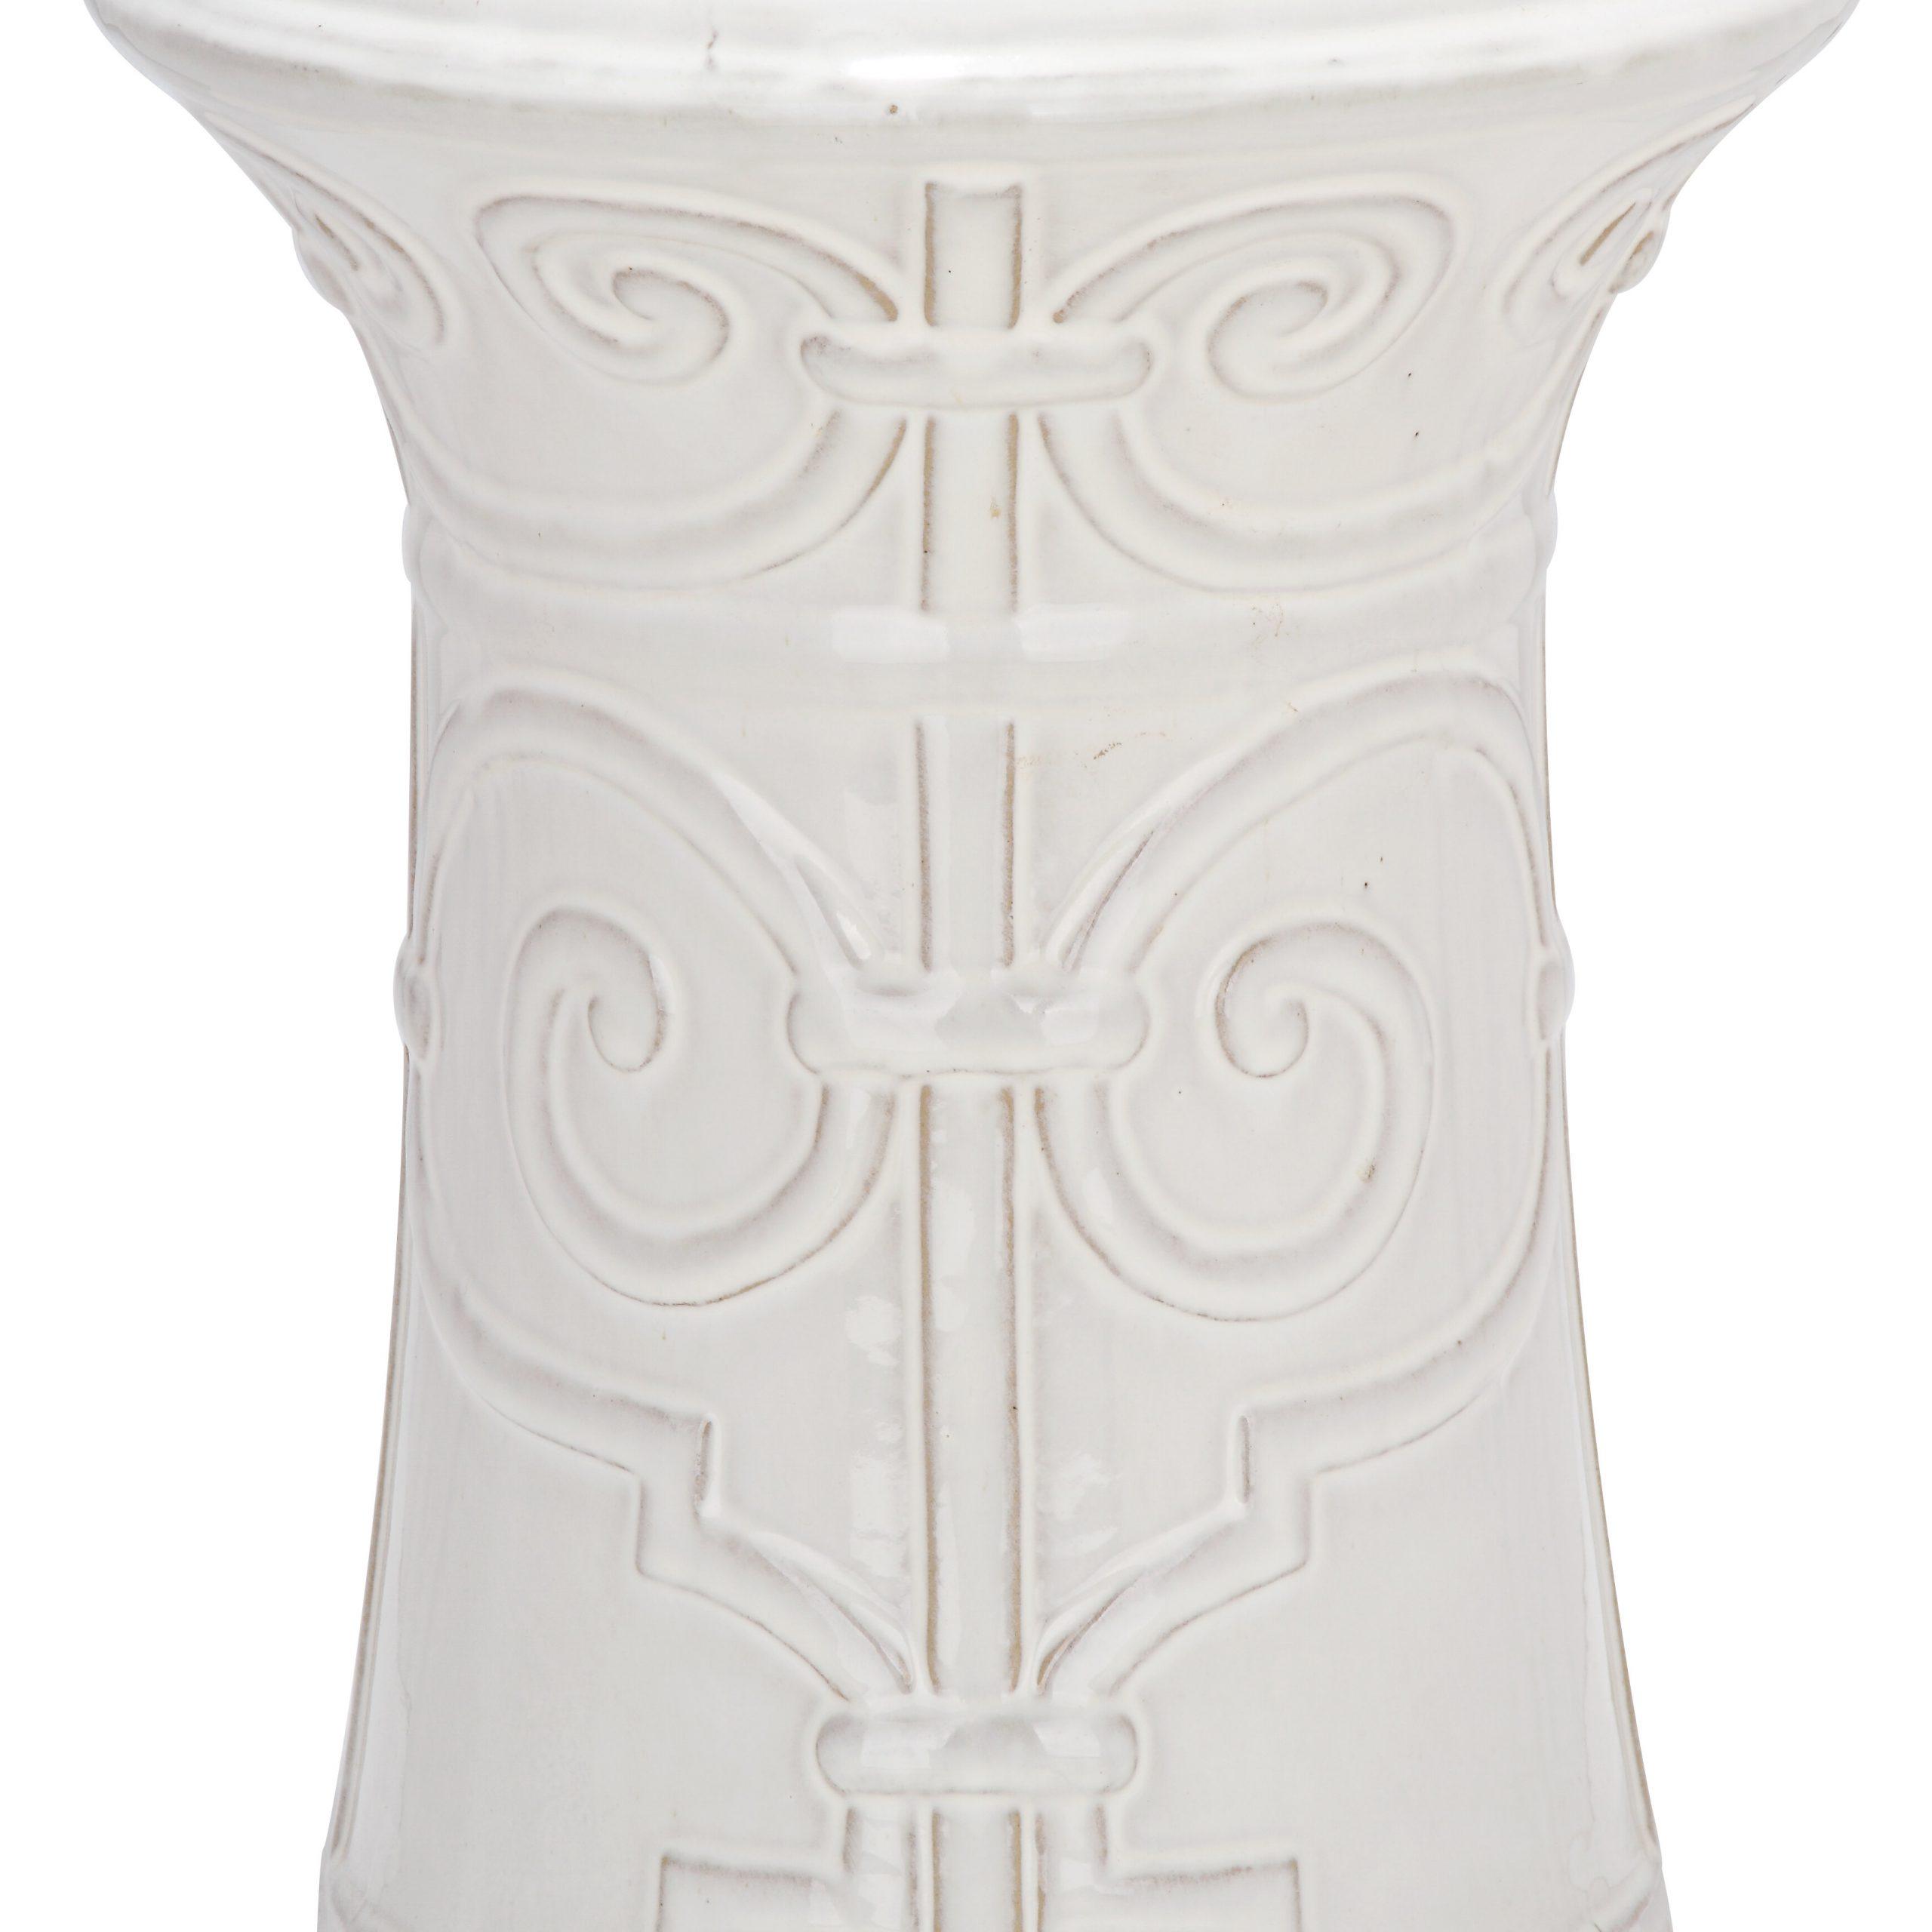 Most Popular Imperial Ceramic Garden Stool For Middlet Owl Ceramic Garden Stools (View 2 of 30)